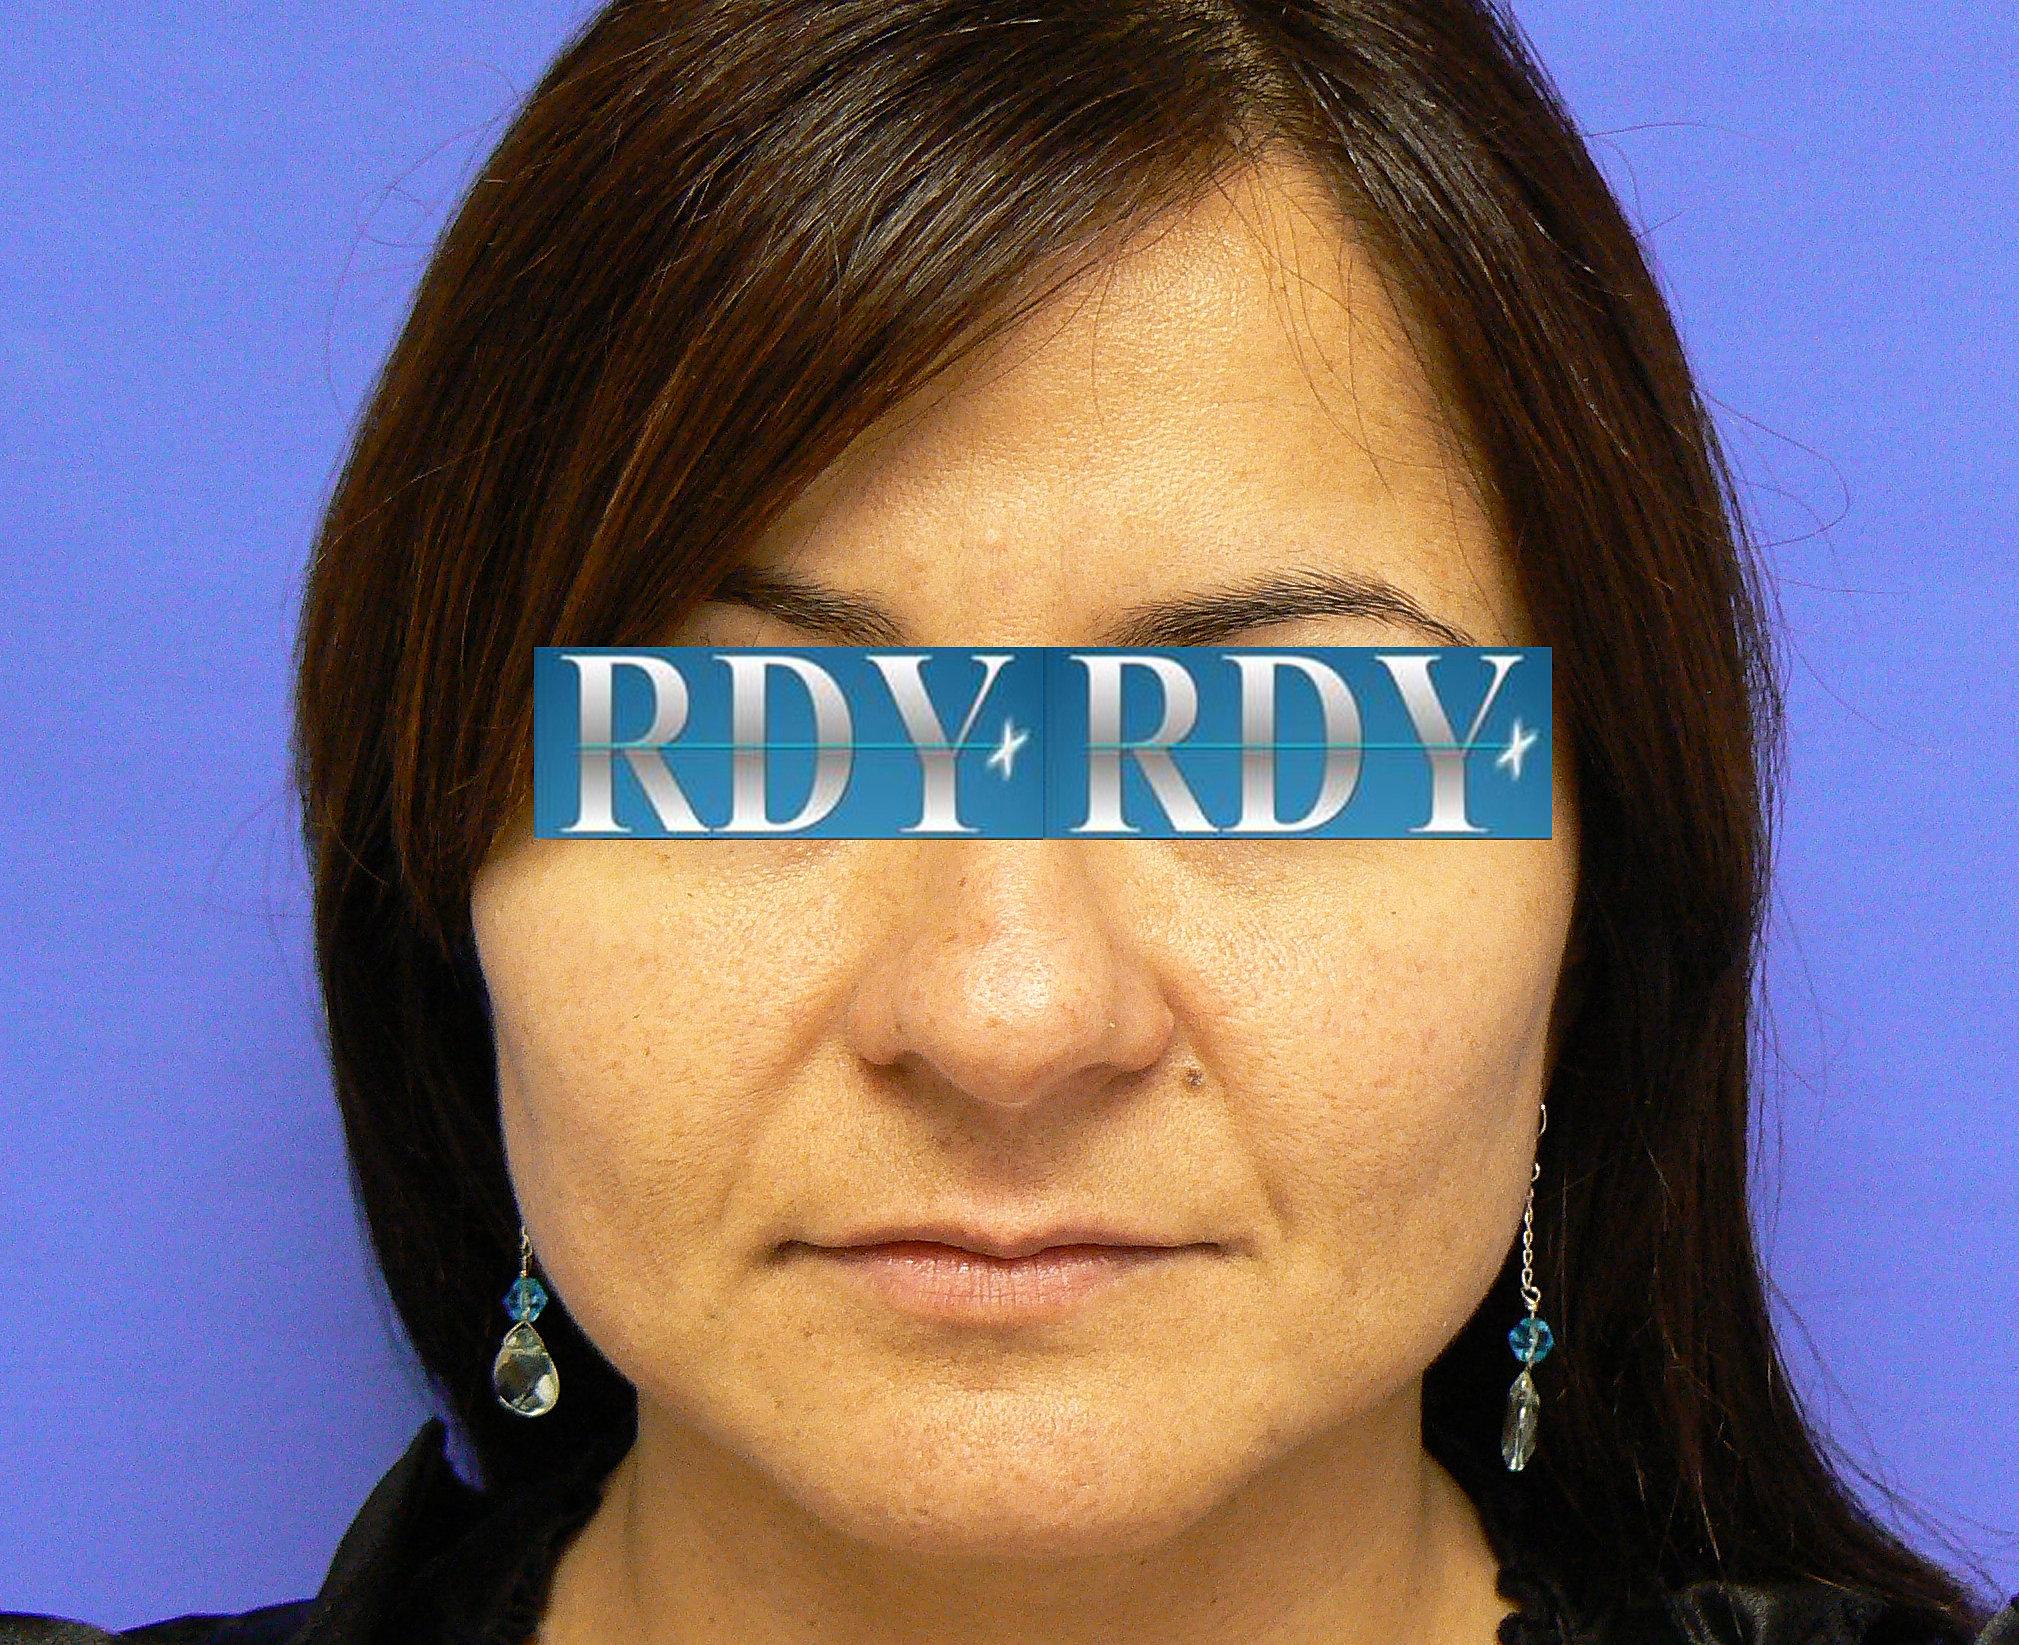 cosmetic surgery media essay